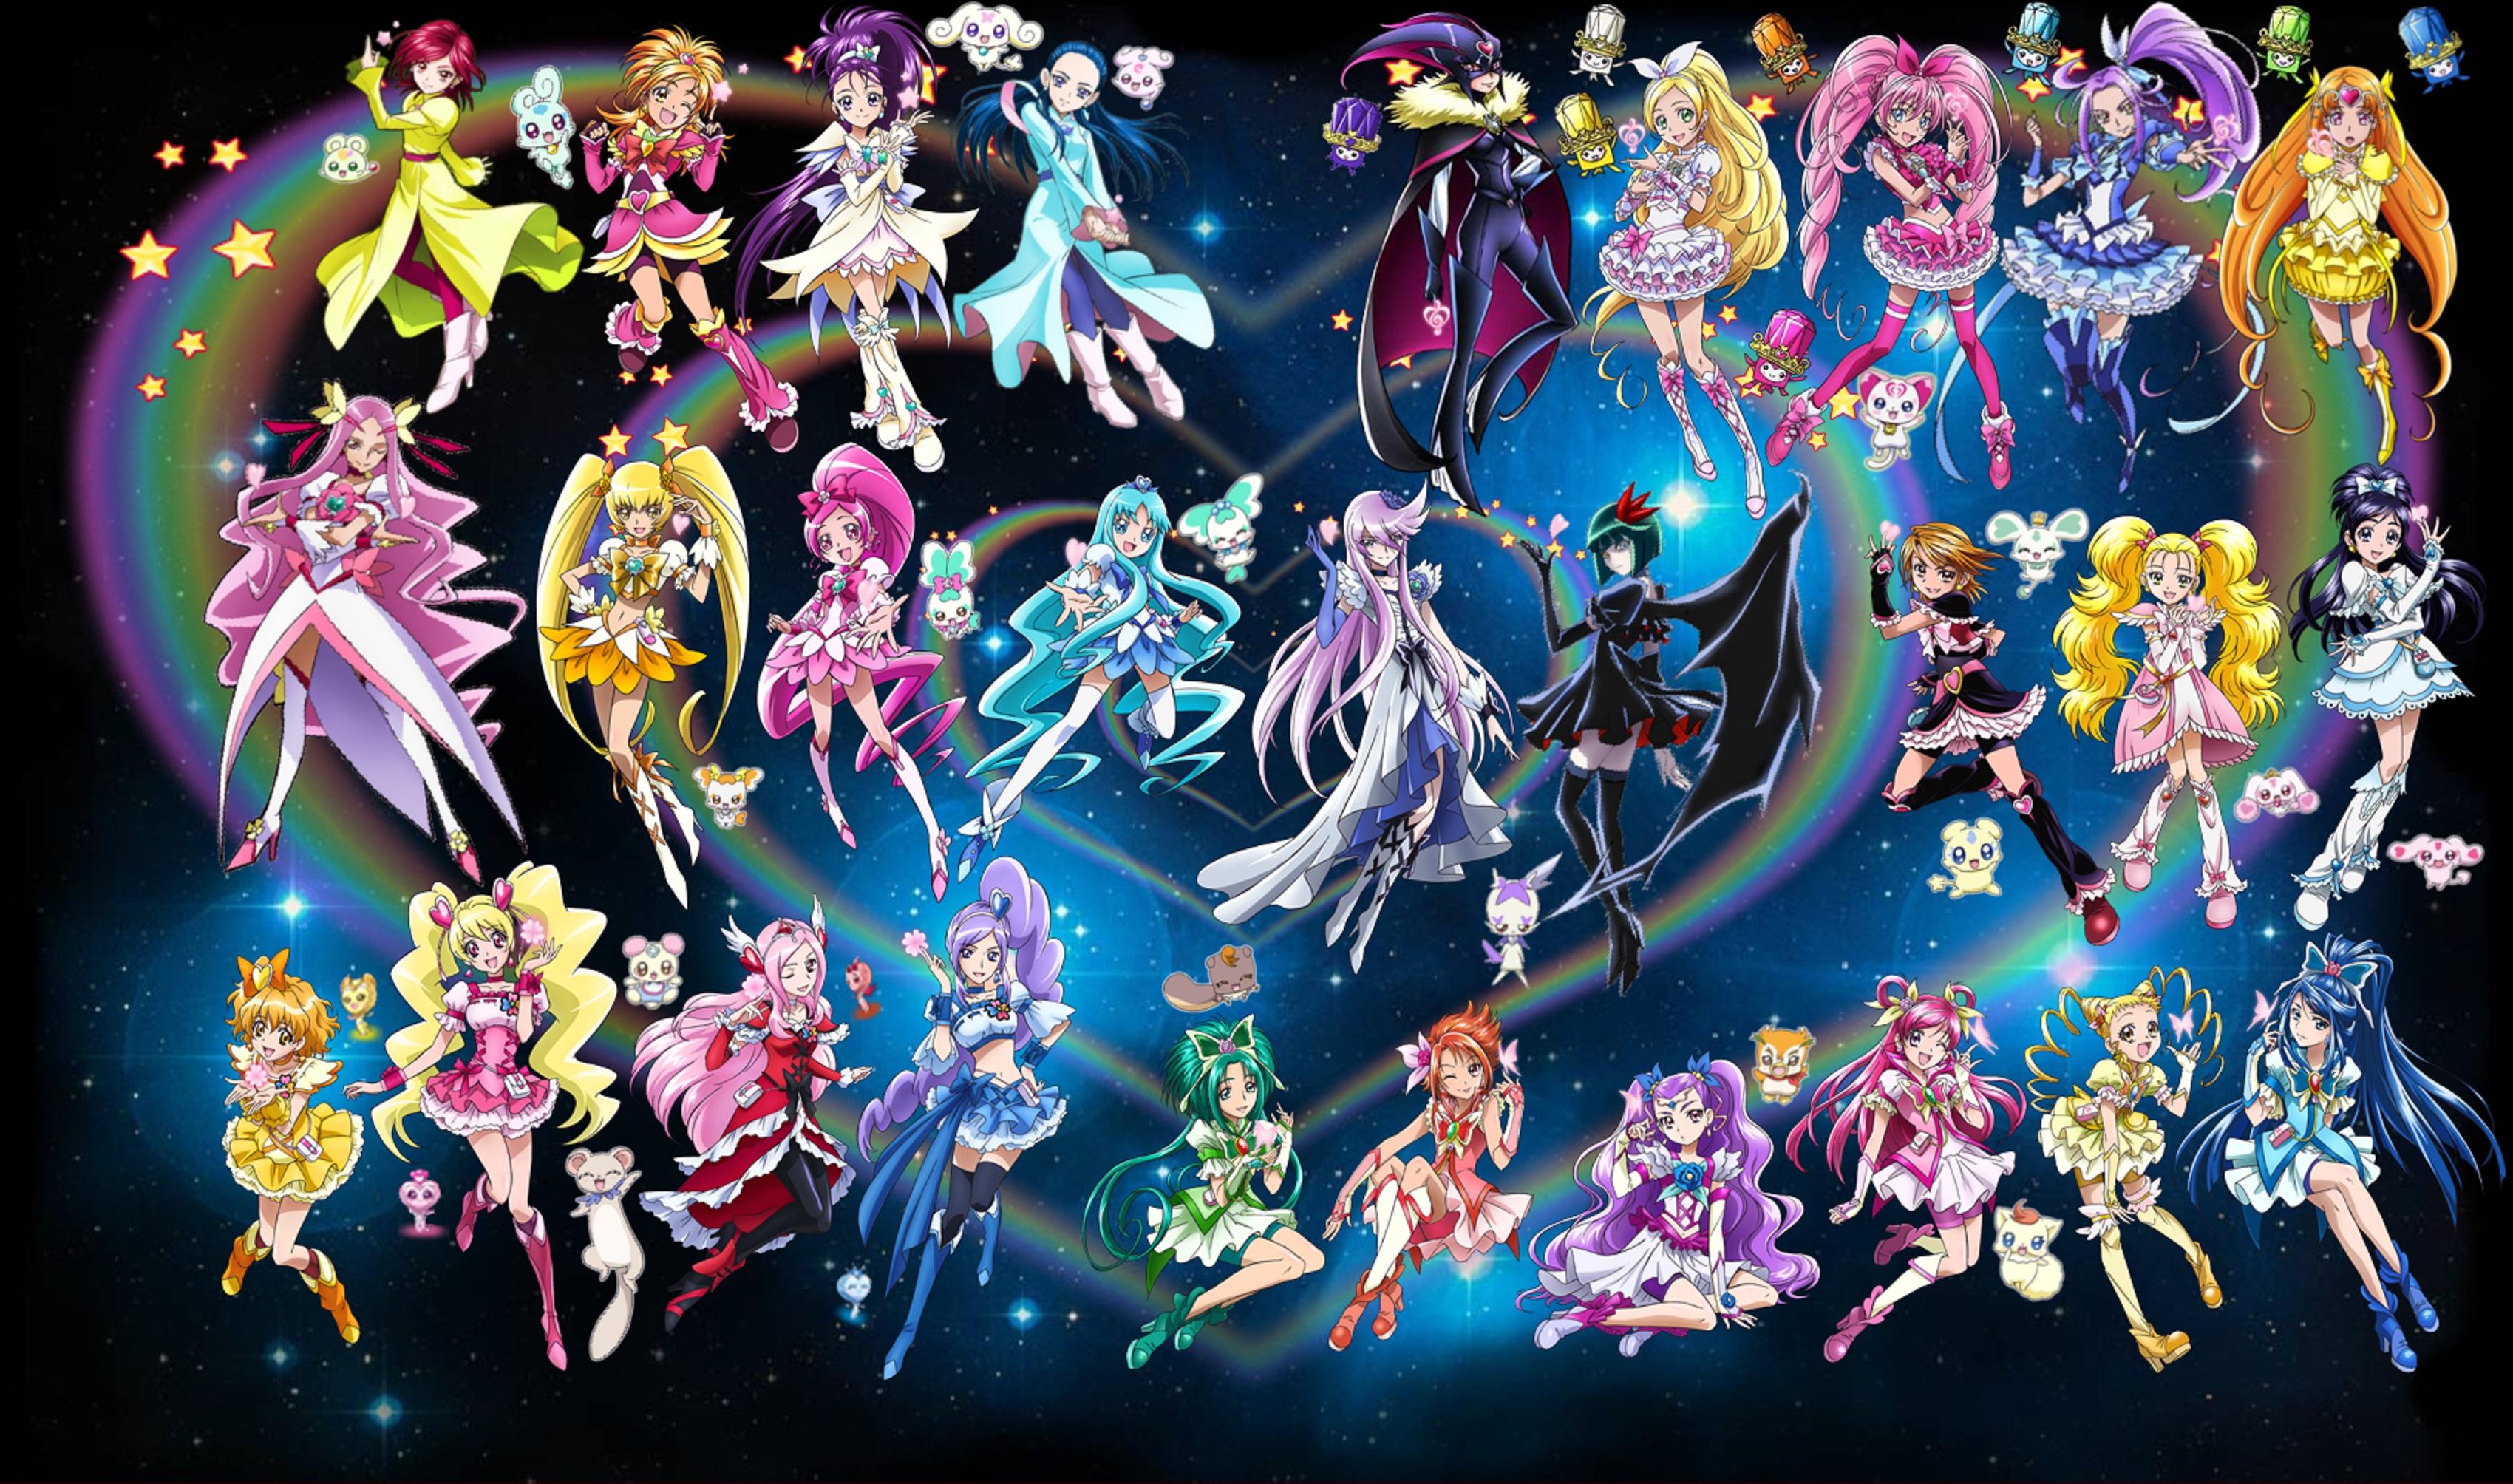 3d Galaxy Wallpaper Hd Pretty Cure Full Hd Wallpaper And Background 3400x2008